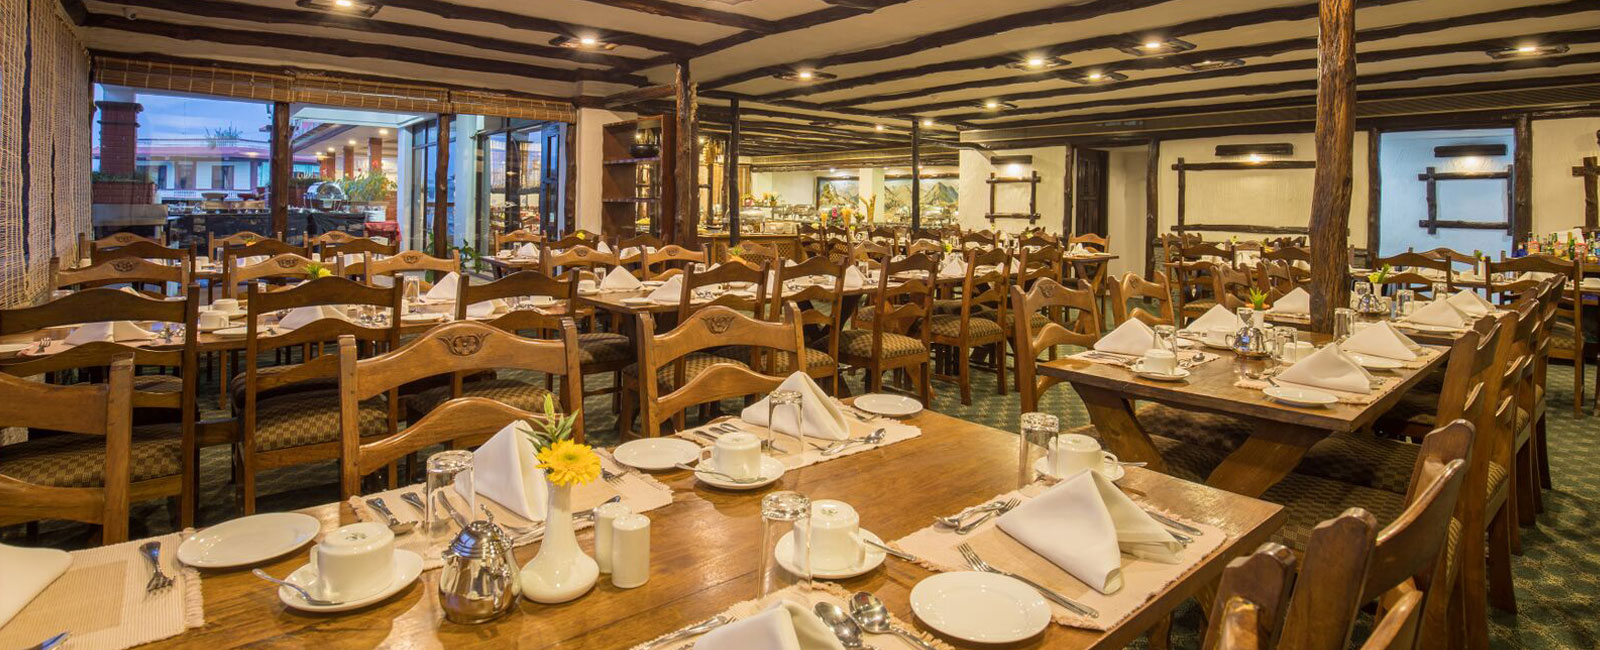 Thasang Restaurant